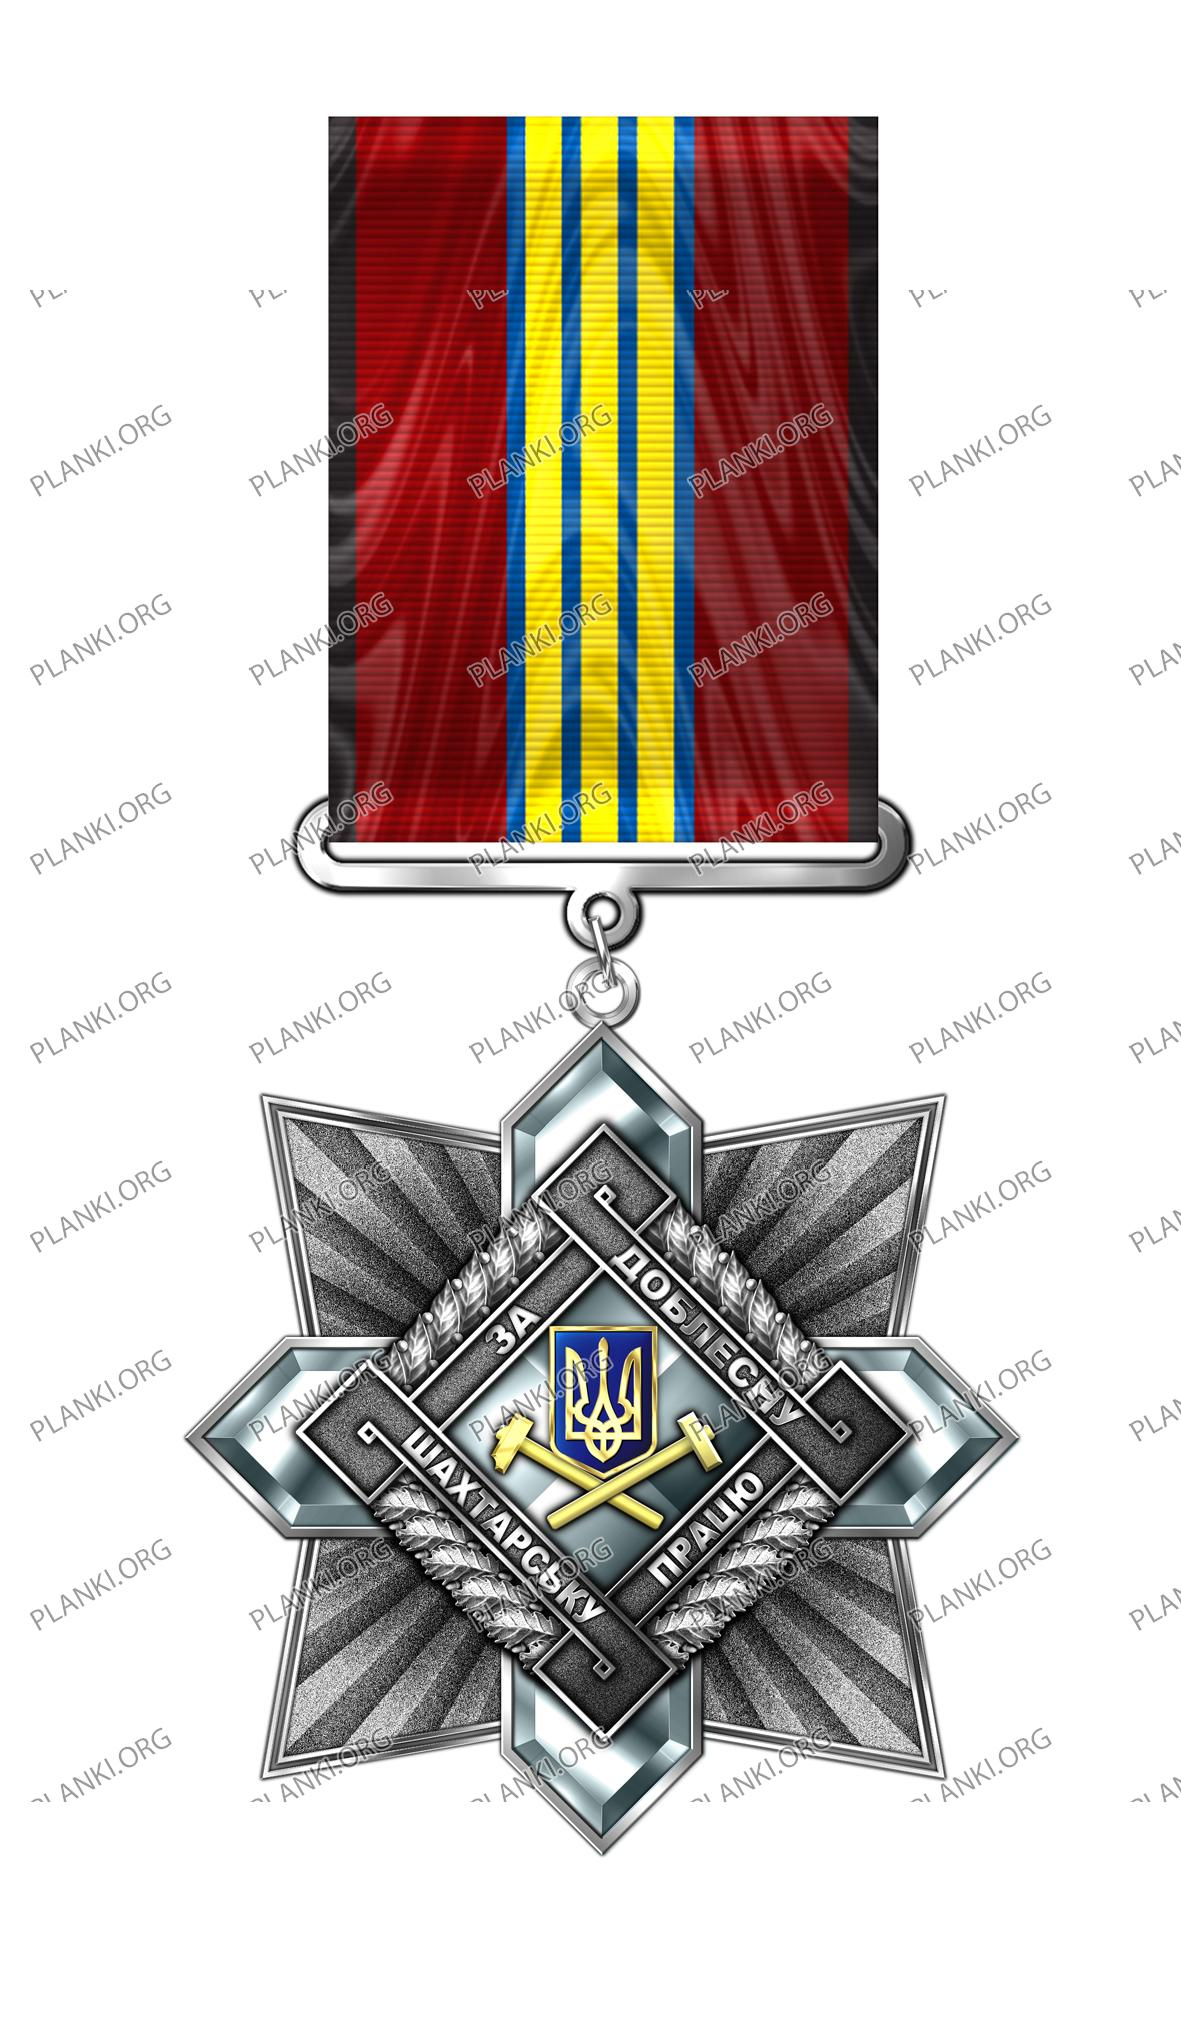 Орден За доблесну шахтарську працю III ступеня